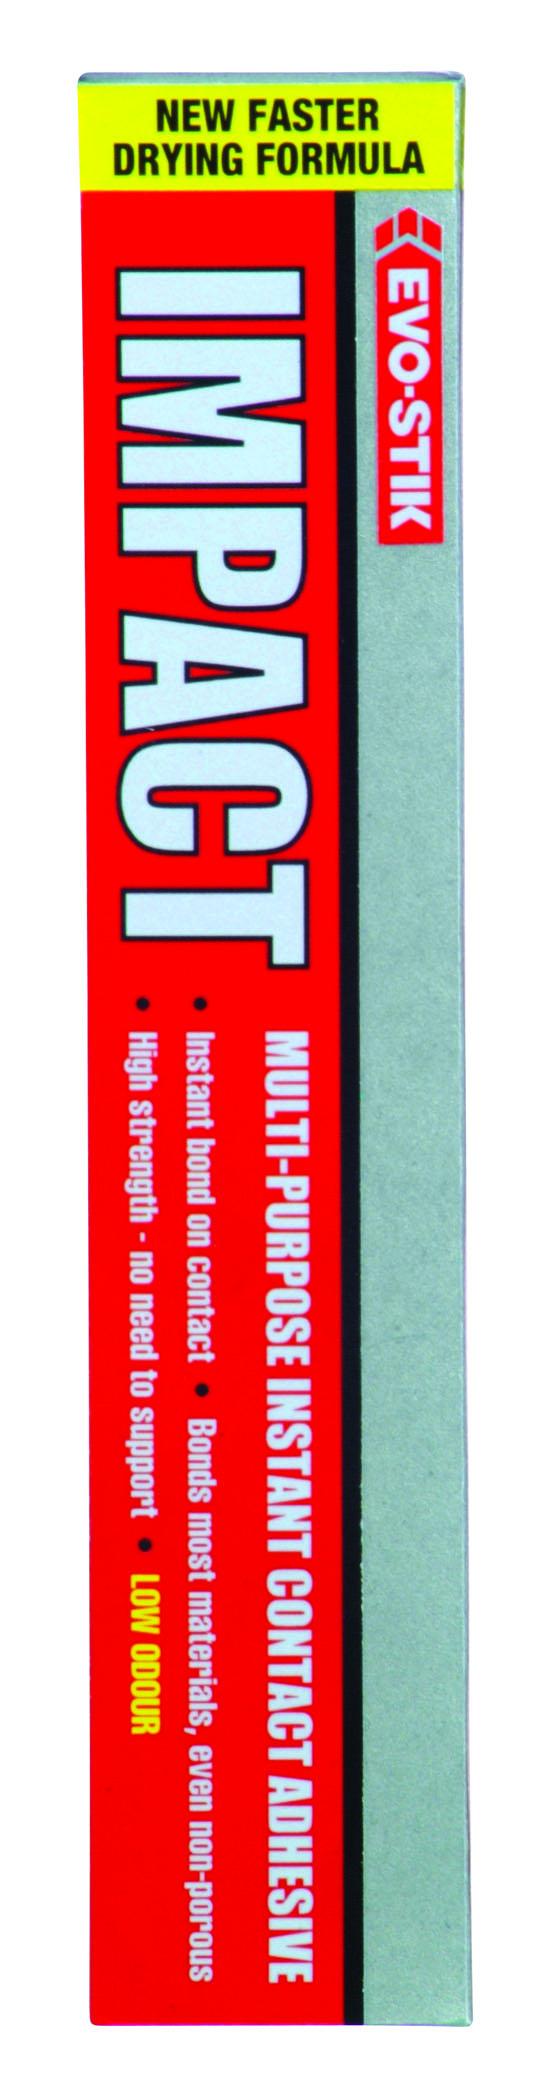 Impact 65 g Carton.jpg